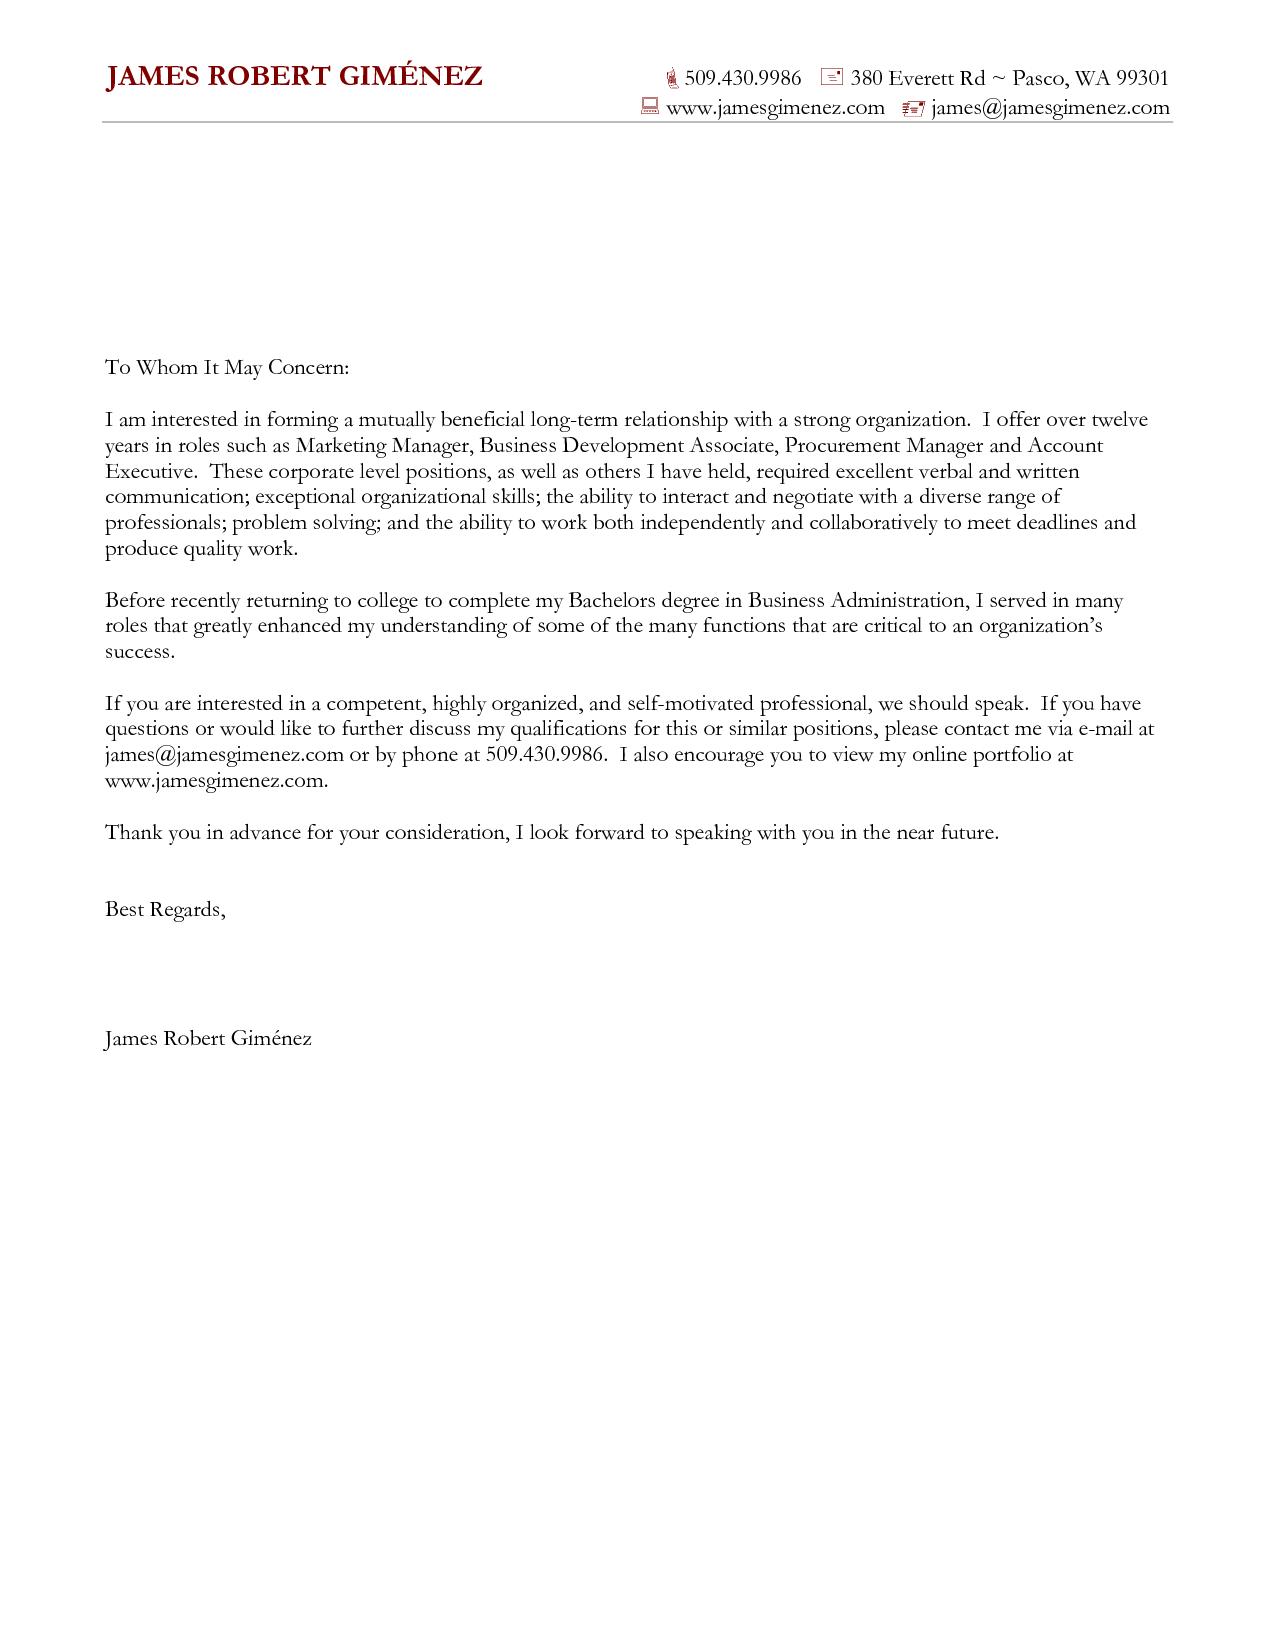 Cover Letter For General Application Cover Letter